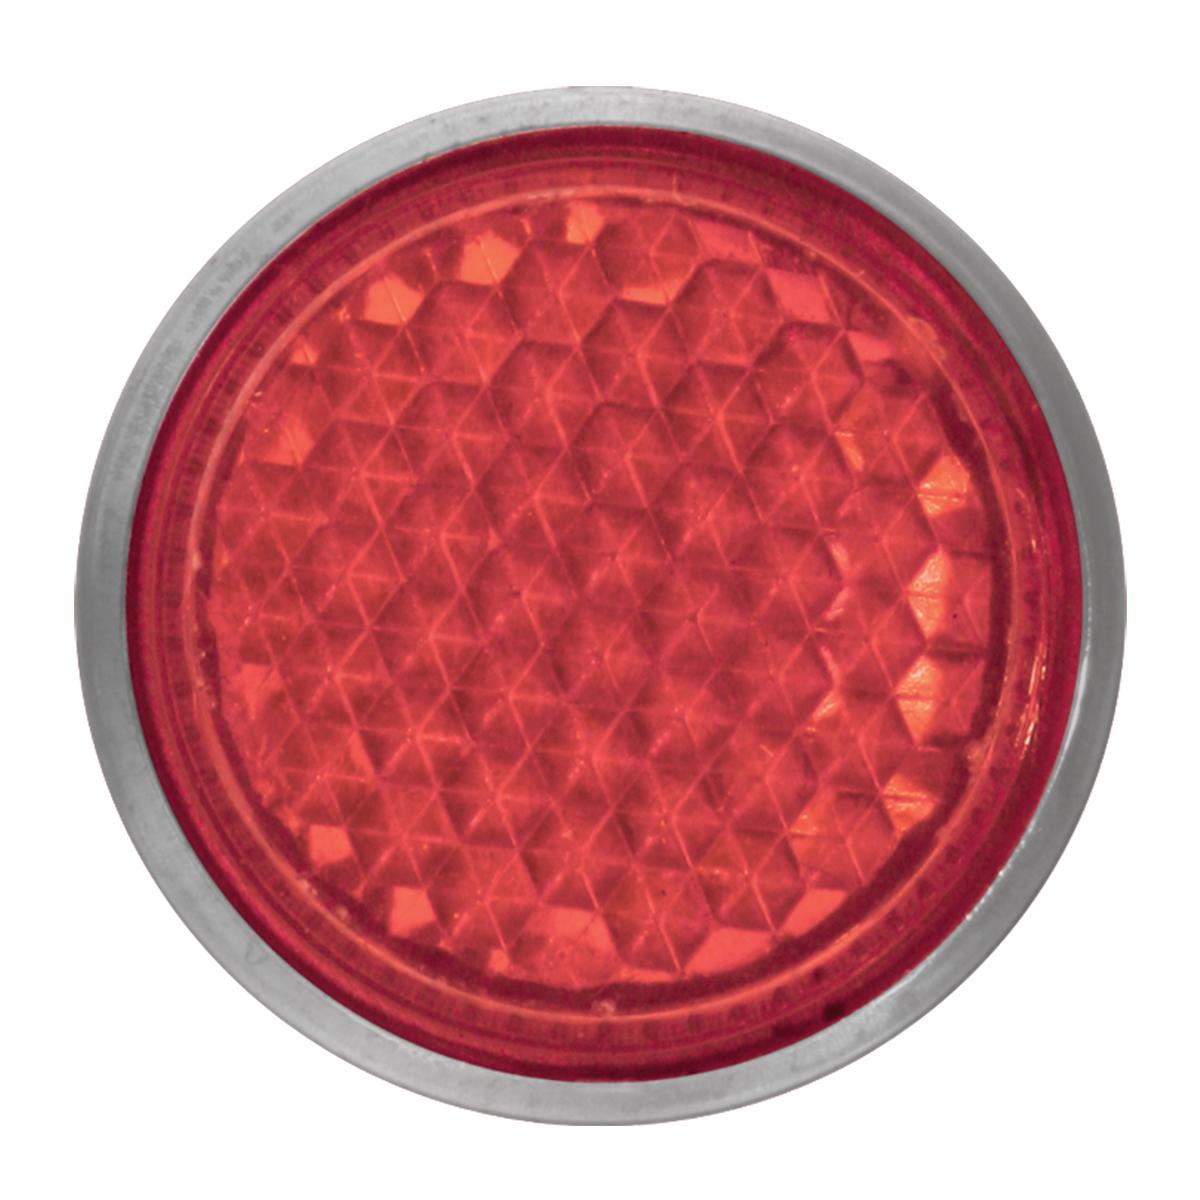 "Red 5/8"" Round Screw Type Mini Reflector"